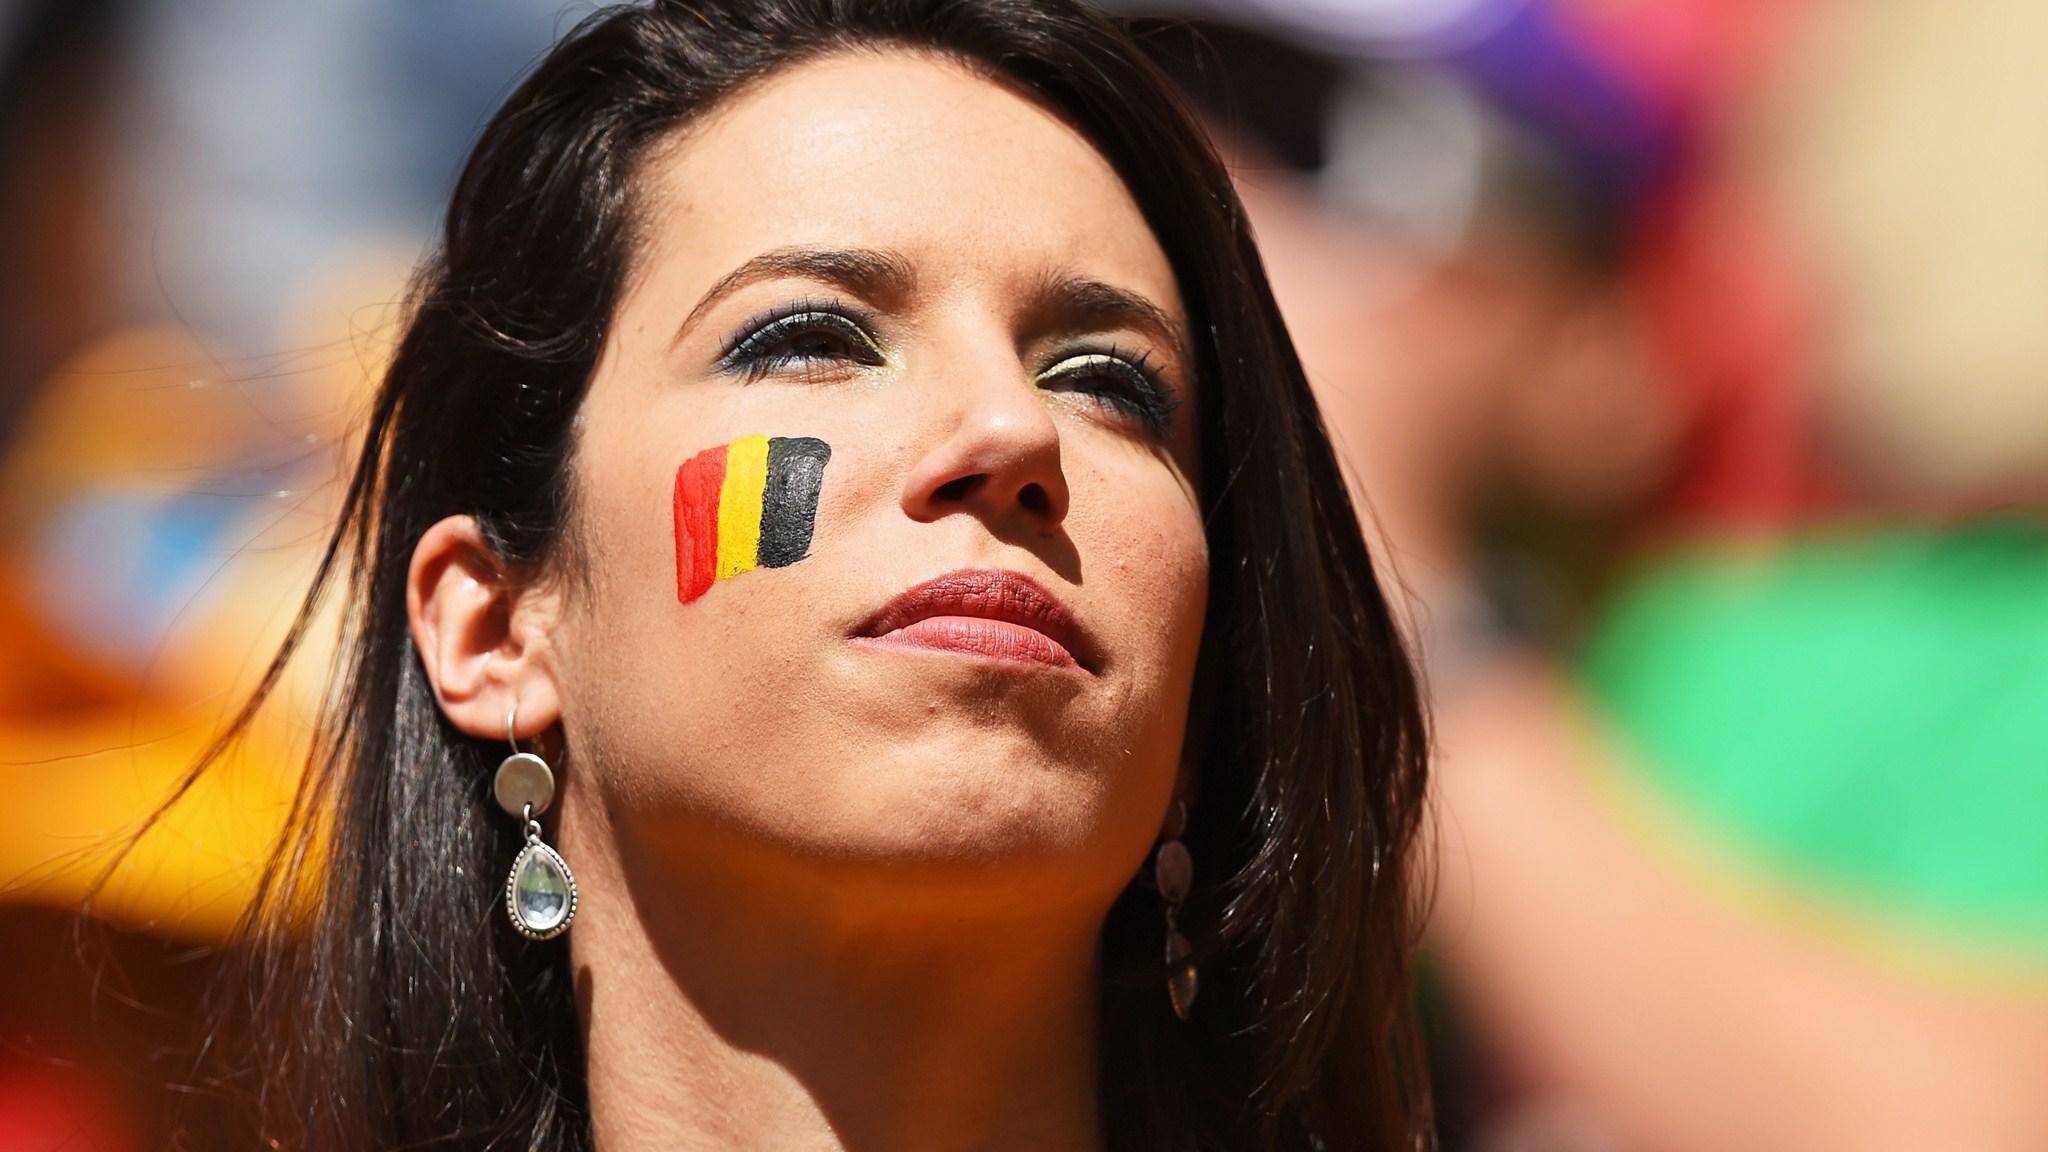 151 - Argentina-Belgium [1-0] -- 05 Jul 2014 - 13-00 - kuaza